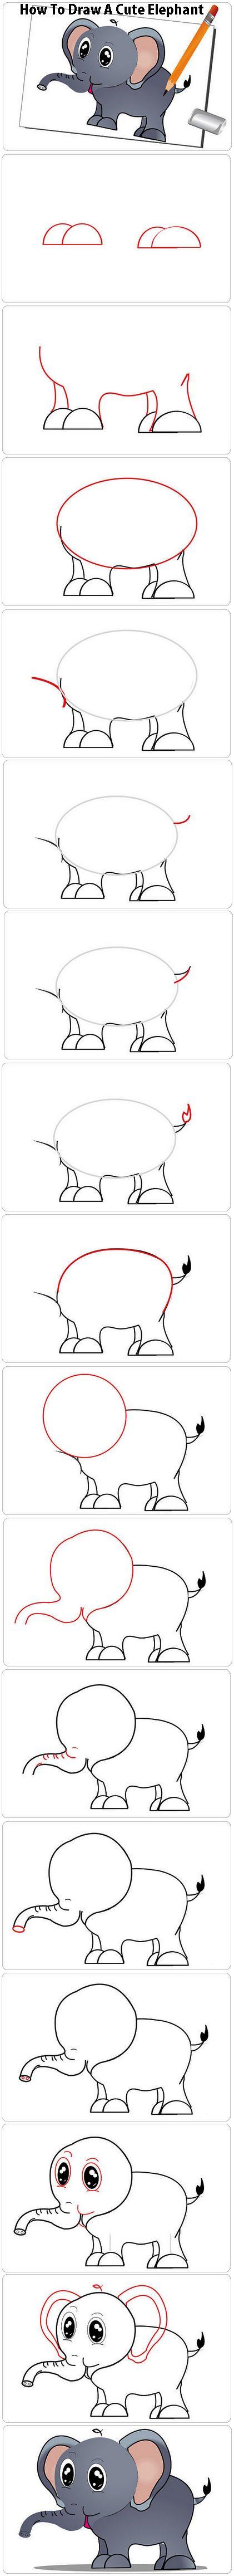 How to Draw a Elephant For Kids, Step by StepHow To Draw A Cute Elephant  http://www.wikihow.com/Draw-a-Cute-Elephant